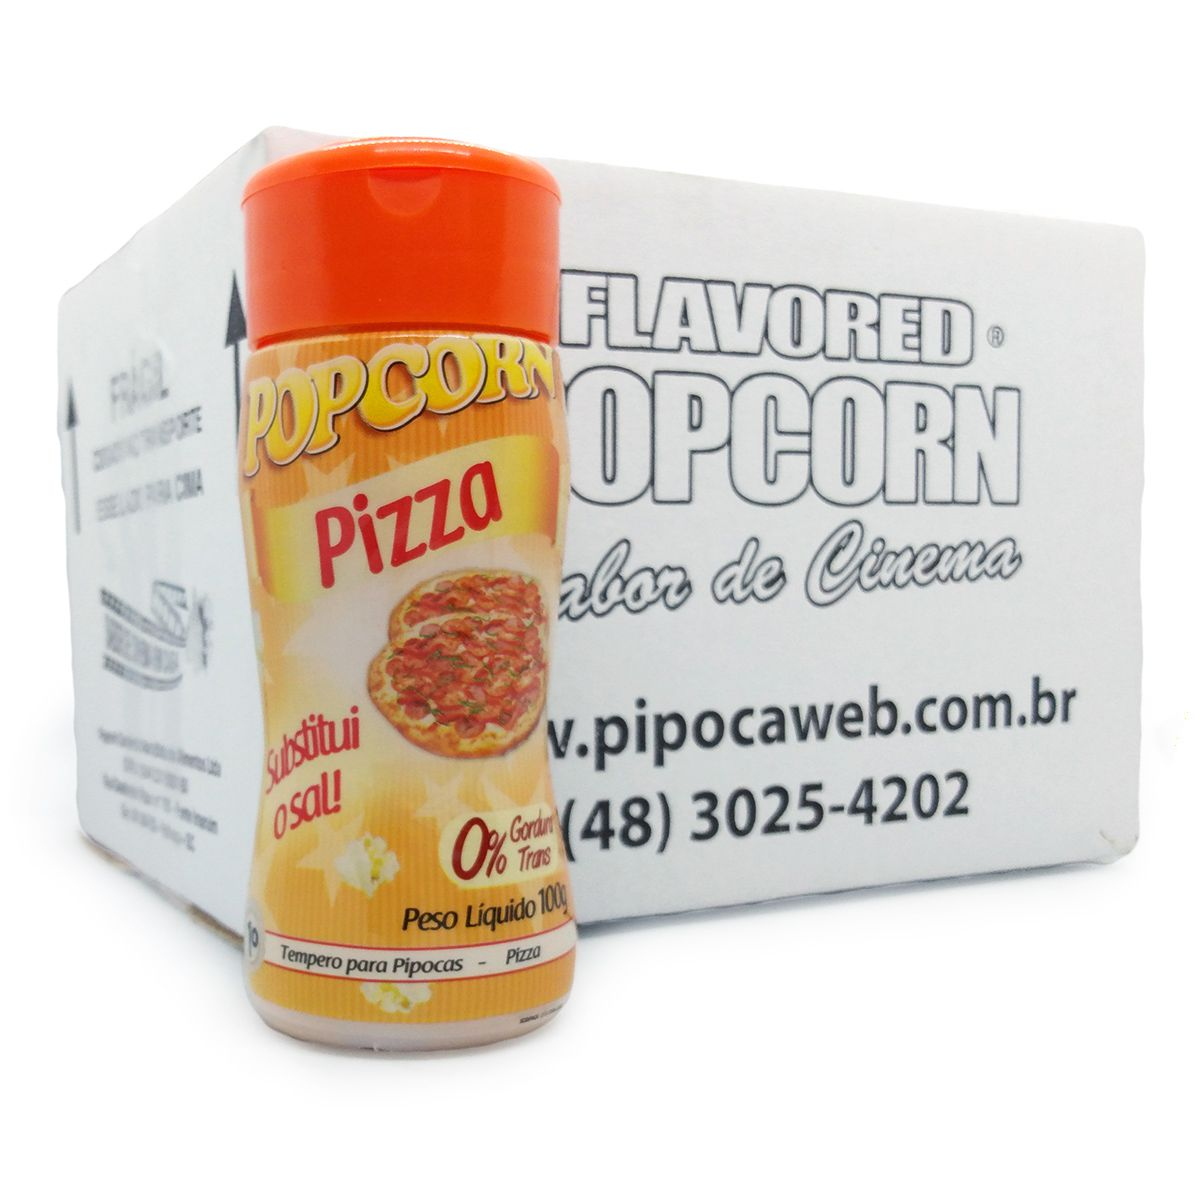 TEMPEROS P/ PIPOCA - SABOR PIZZA 100g - CAixa c/ 12 Un - R$ 7,66 cada